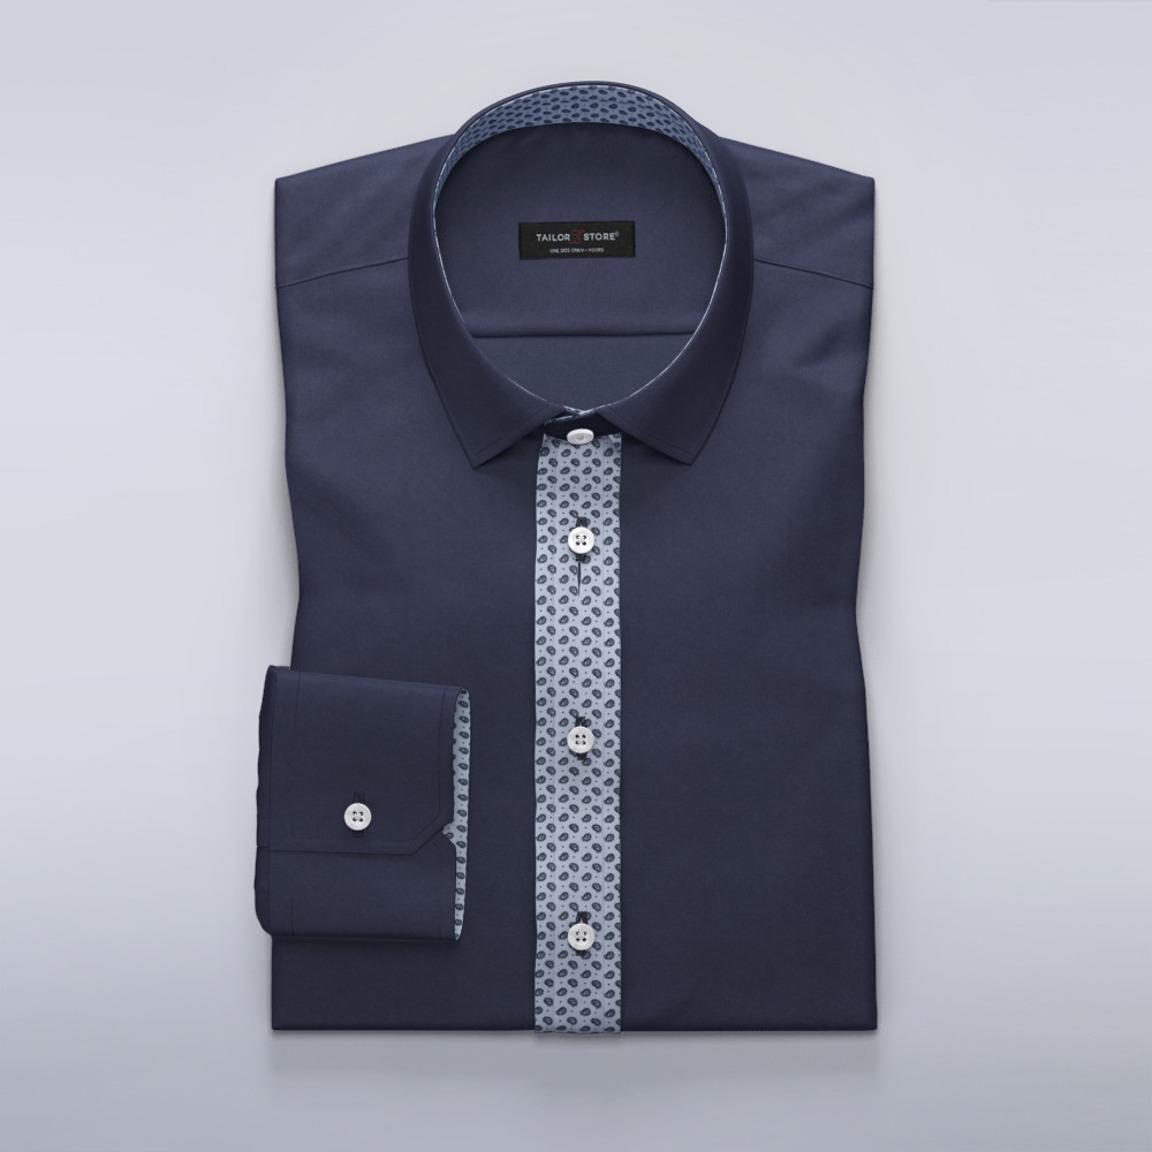 Satin shirt in Vanderlay with hinton print contrasts